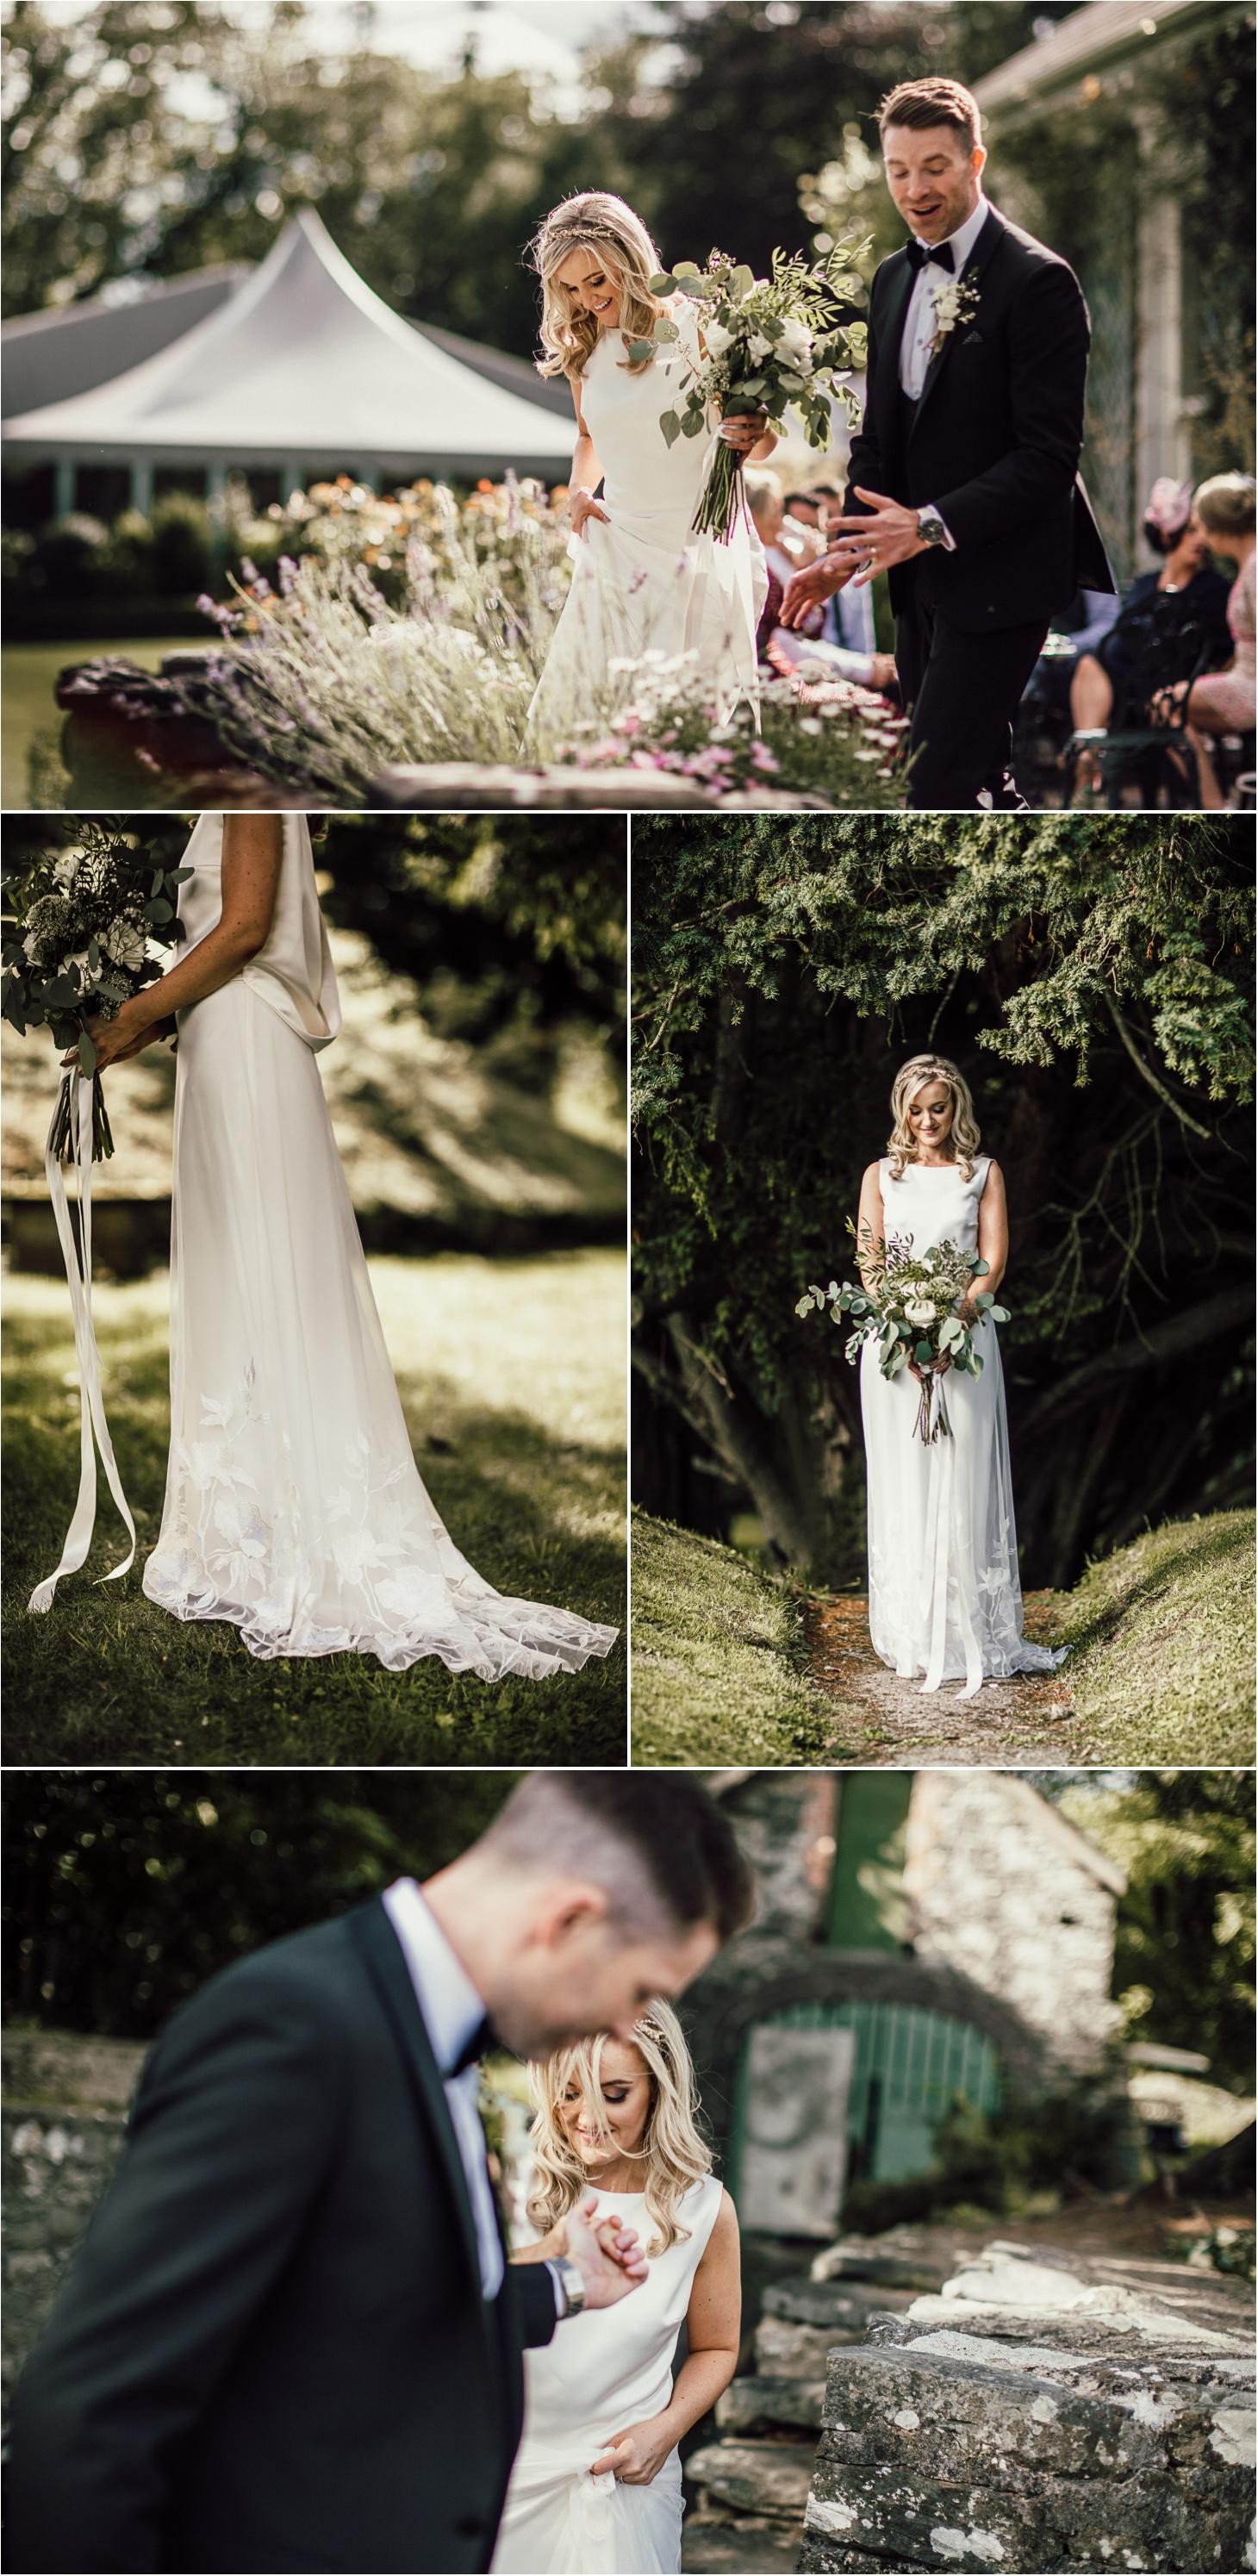 Virgina Lodge Photography. darren fitzpatrick. Wedding.20